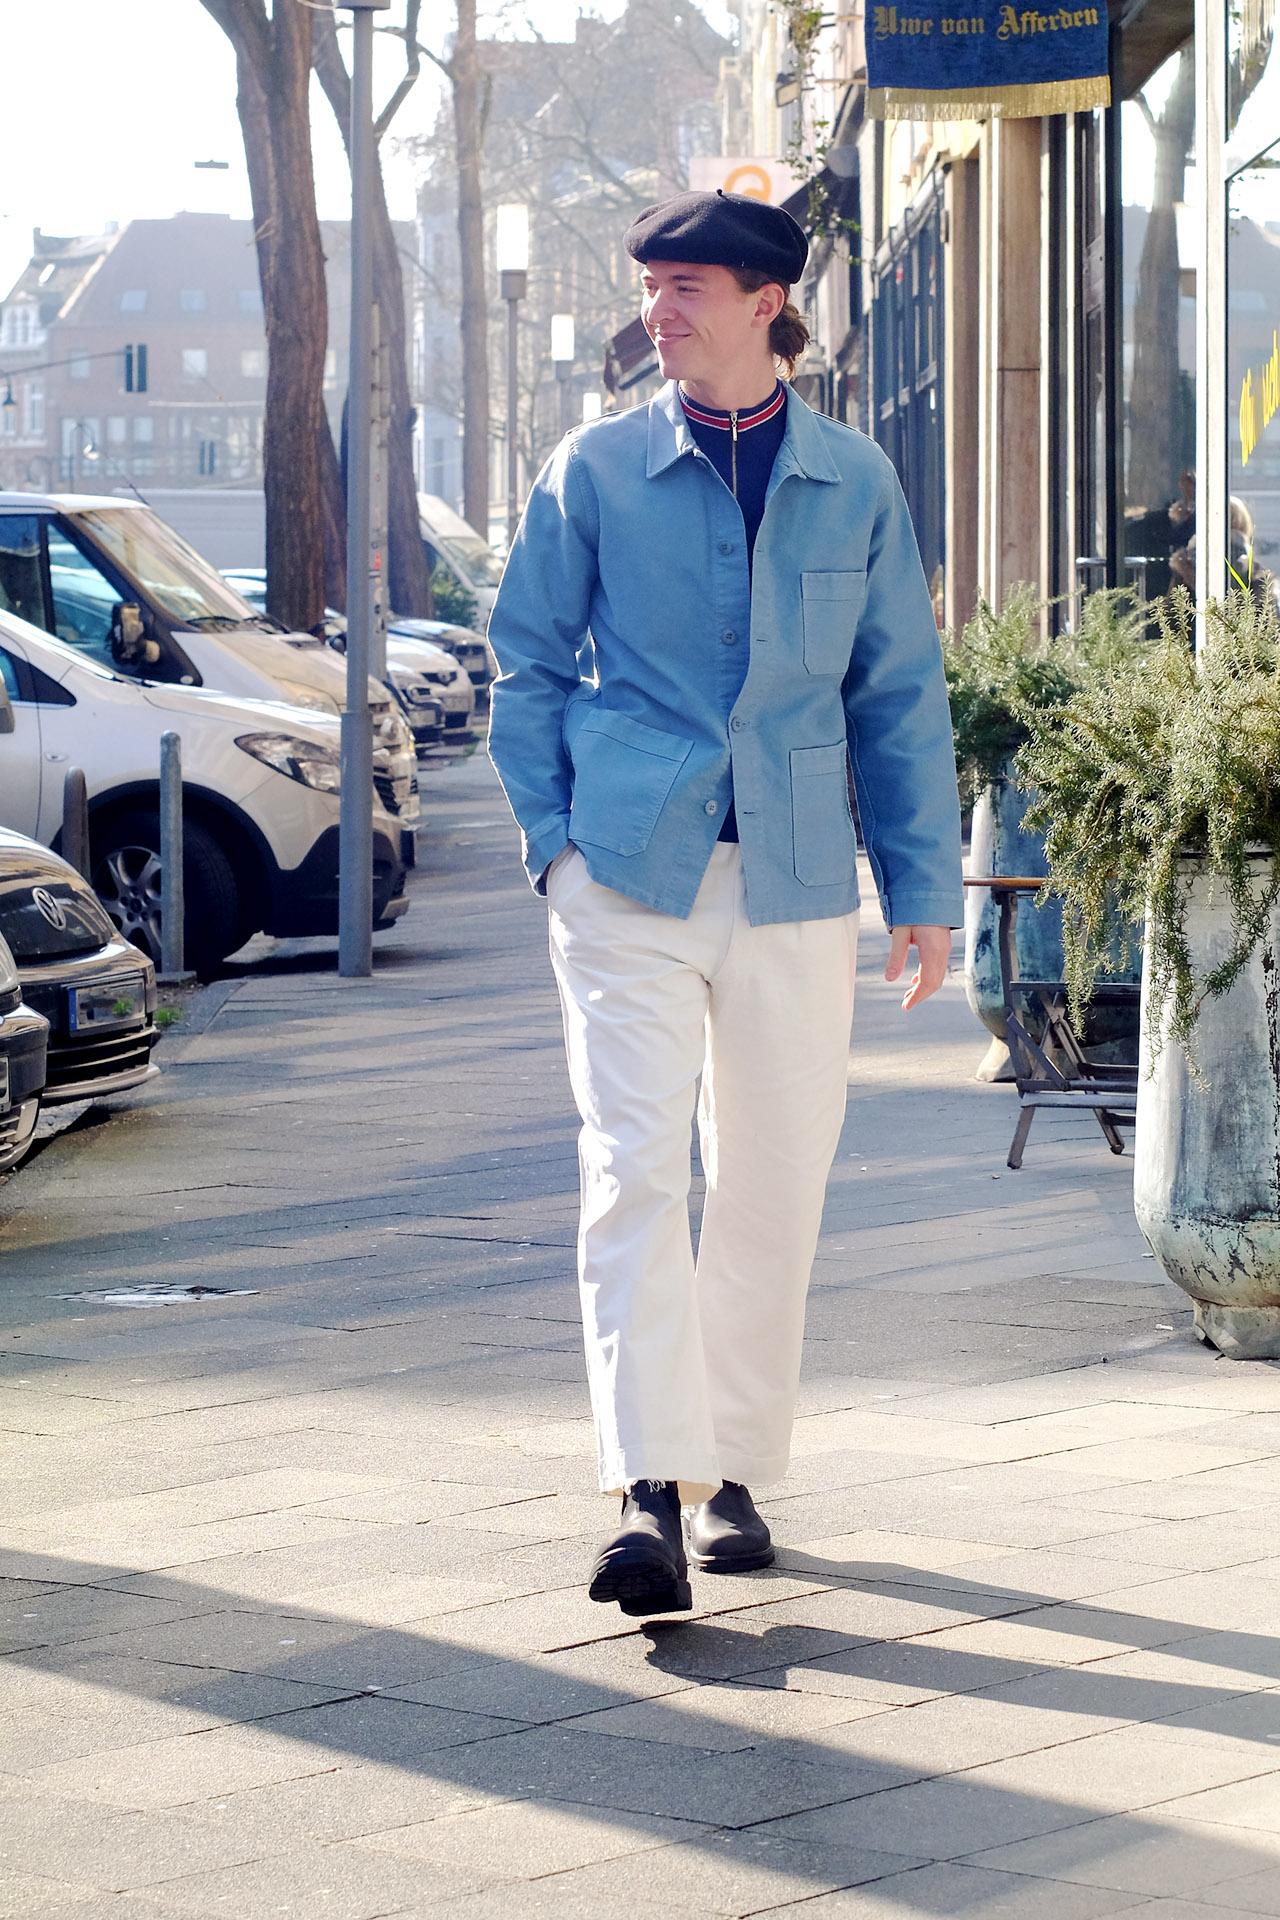 lemontstmichel-outfit-rennradtrikot-vintage-trikot-baskenmuetze-01